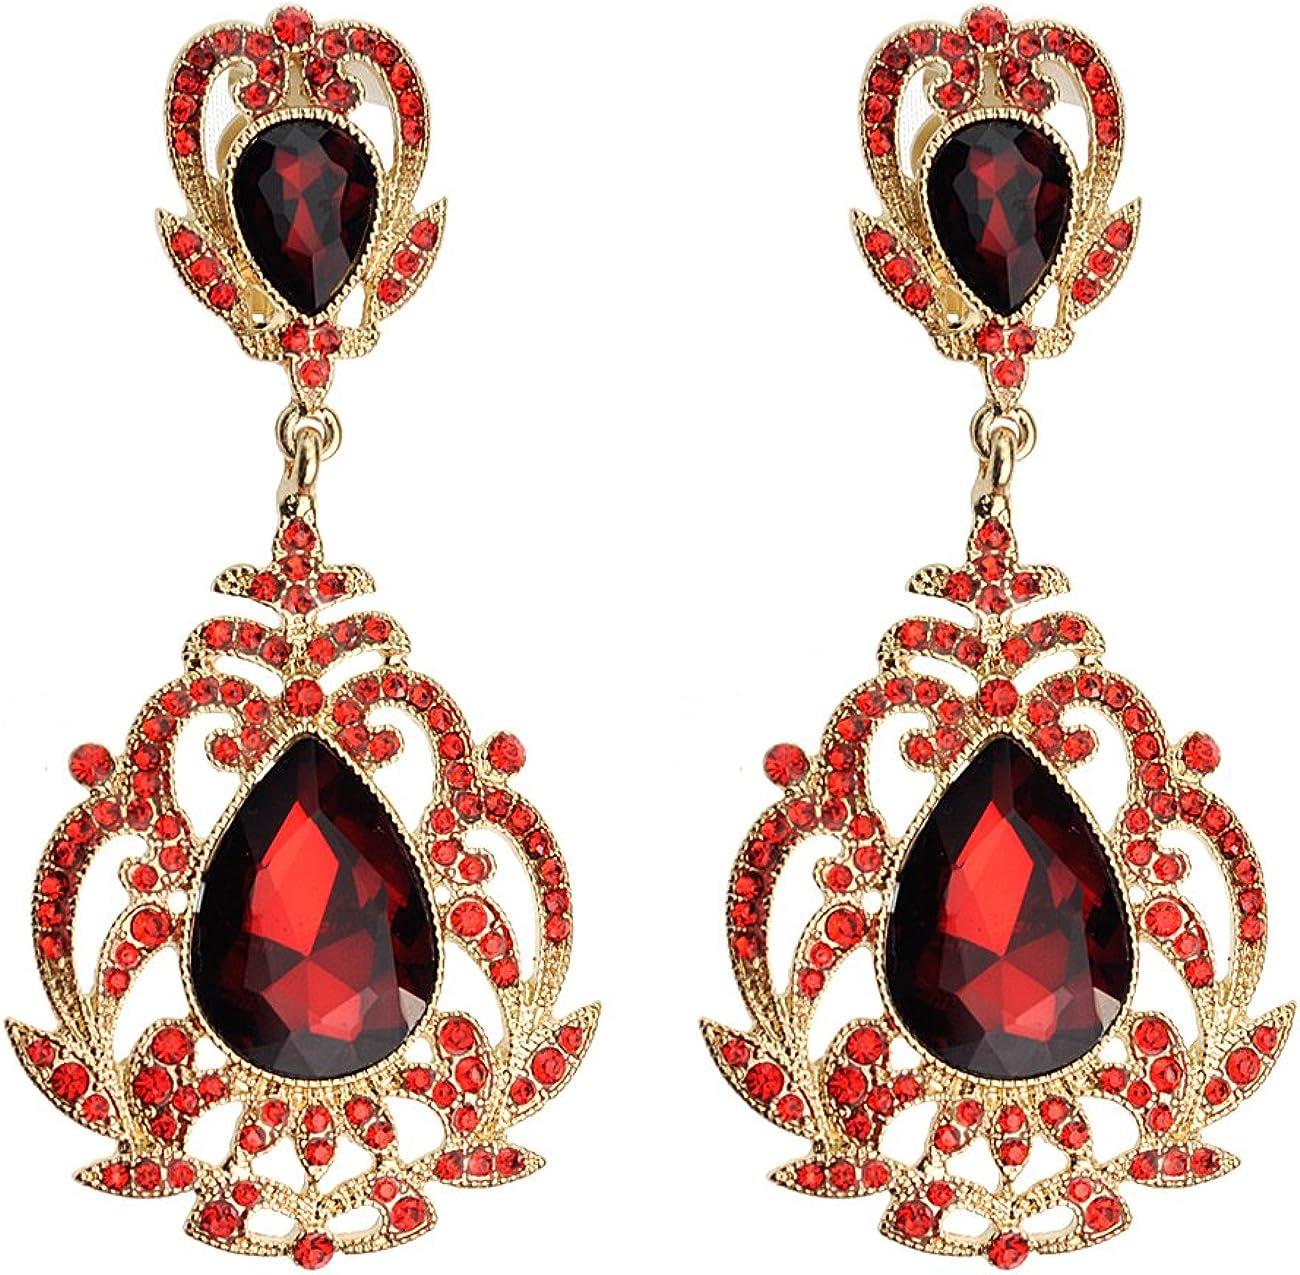 Rhinestone Studded Filigree Teardrop Stone Clip On Fashion Earrings